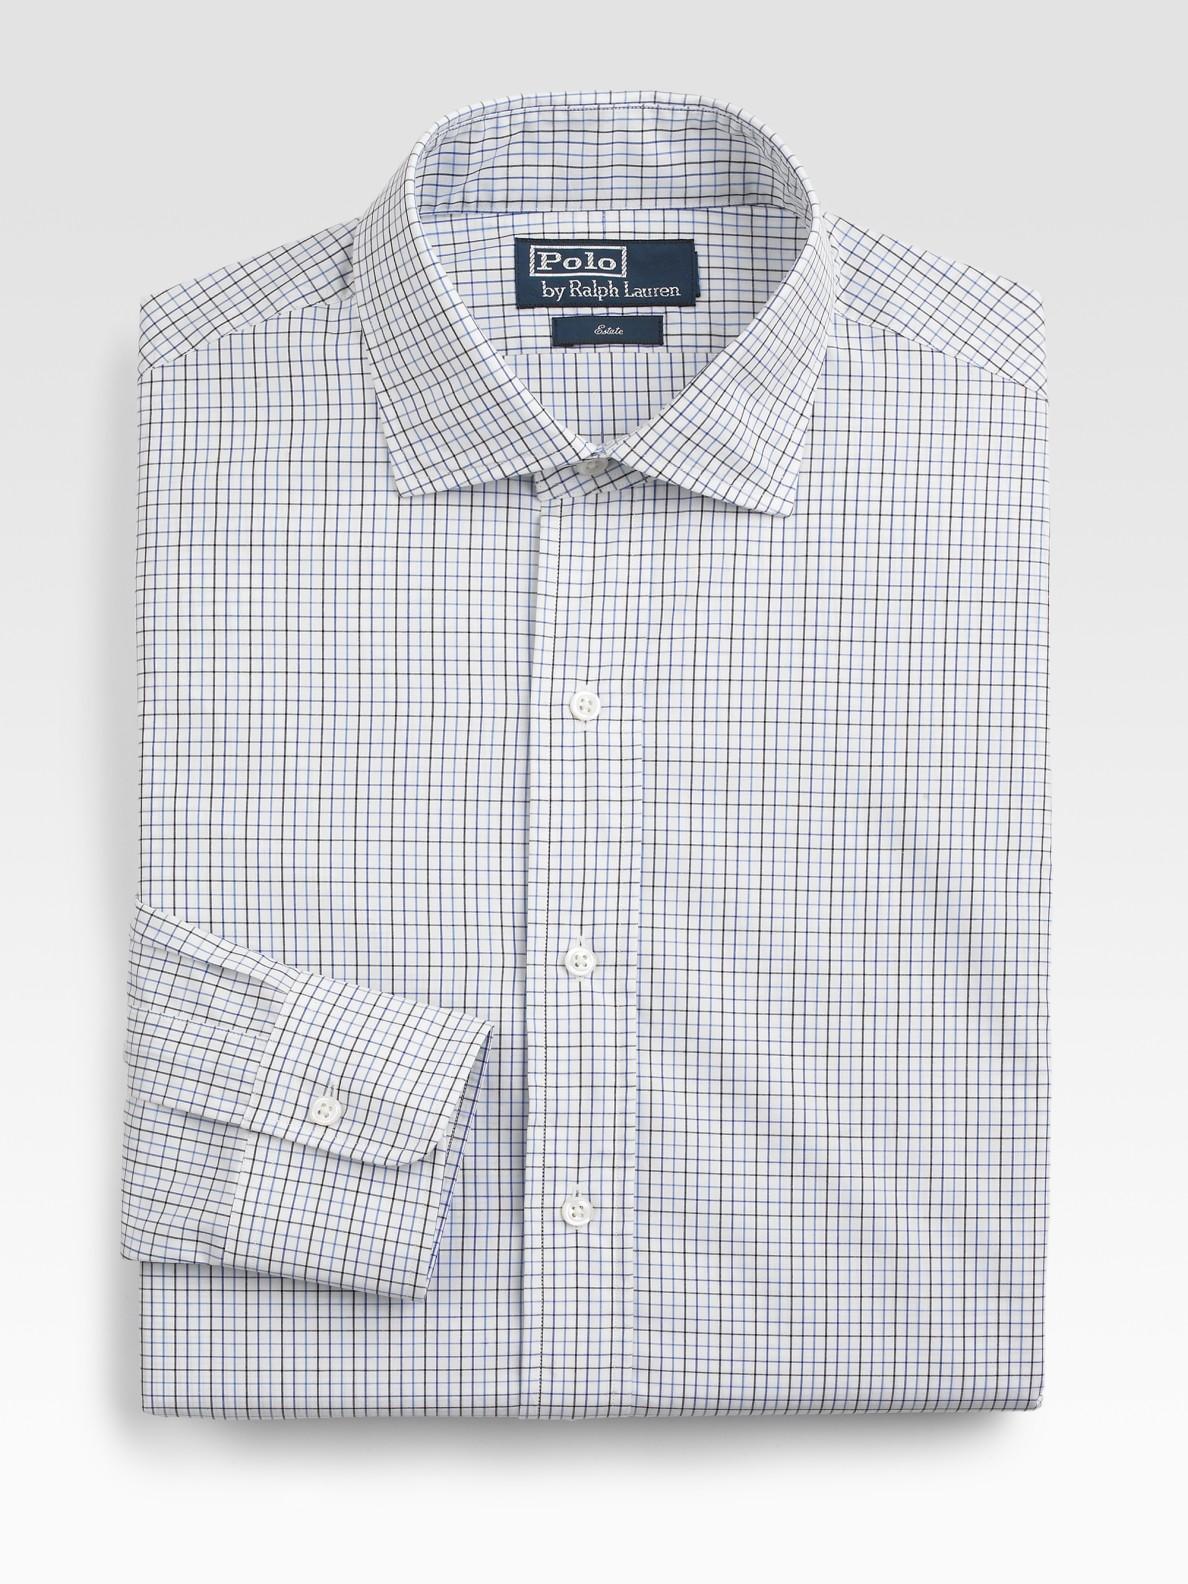 Polo ralph lauren custom fit dress shirts for Custom fit dress shirts